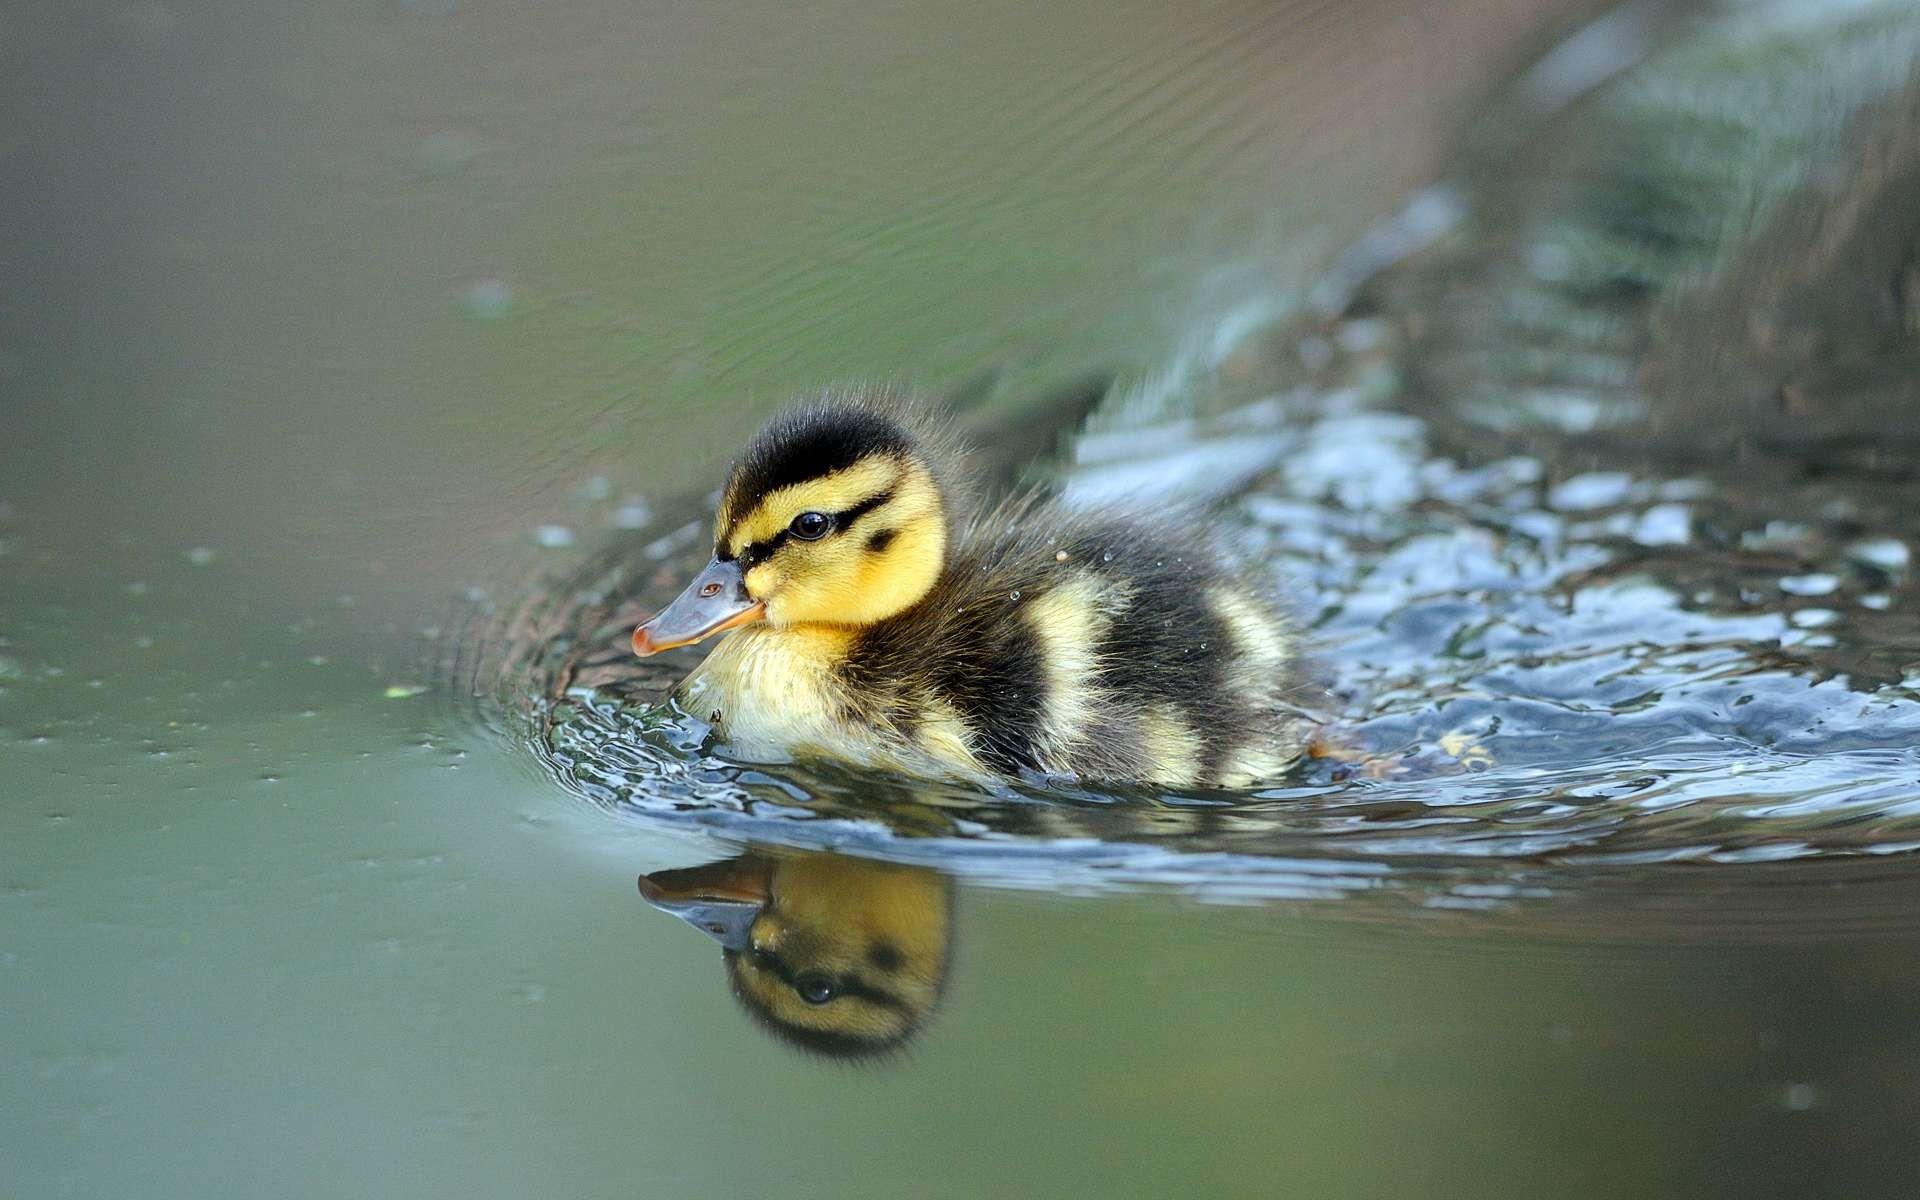 Res: 1920x1200, Animal - Duck Wallpaper